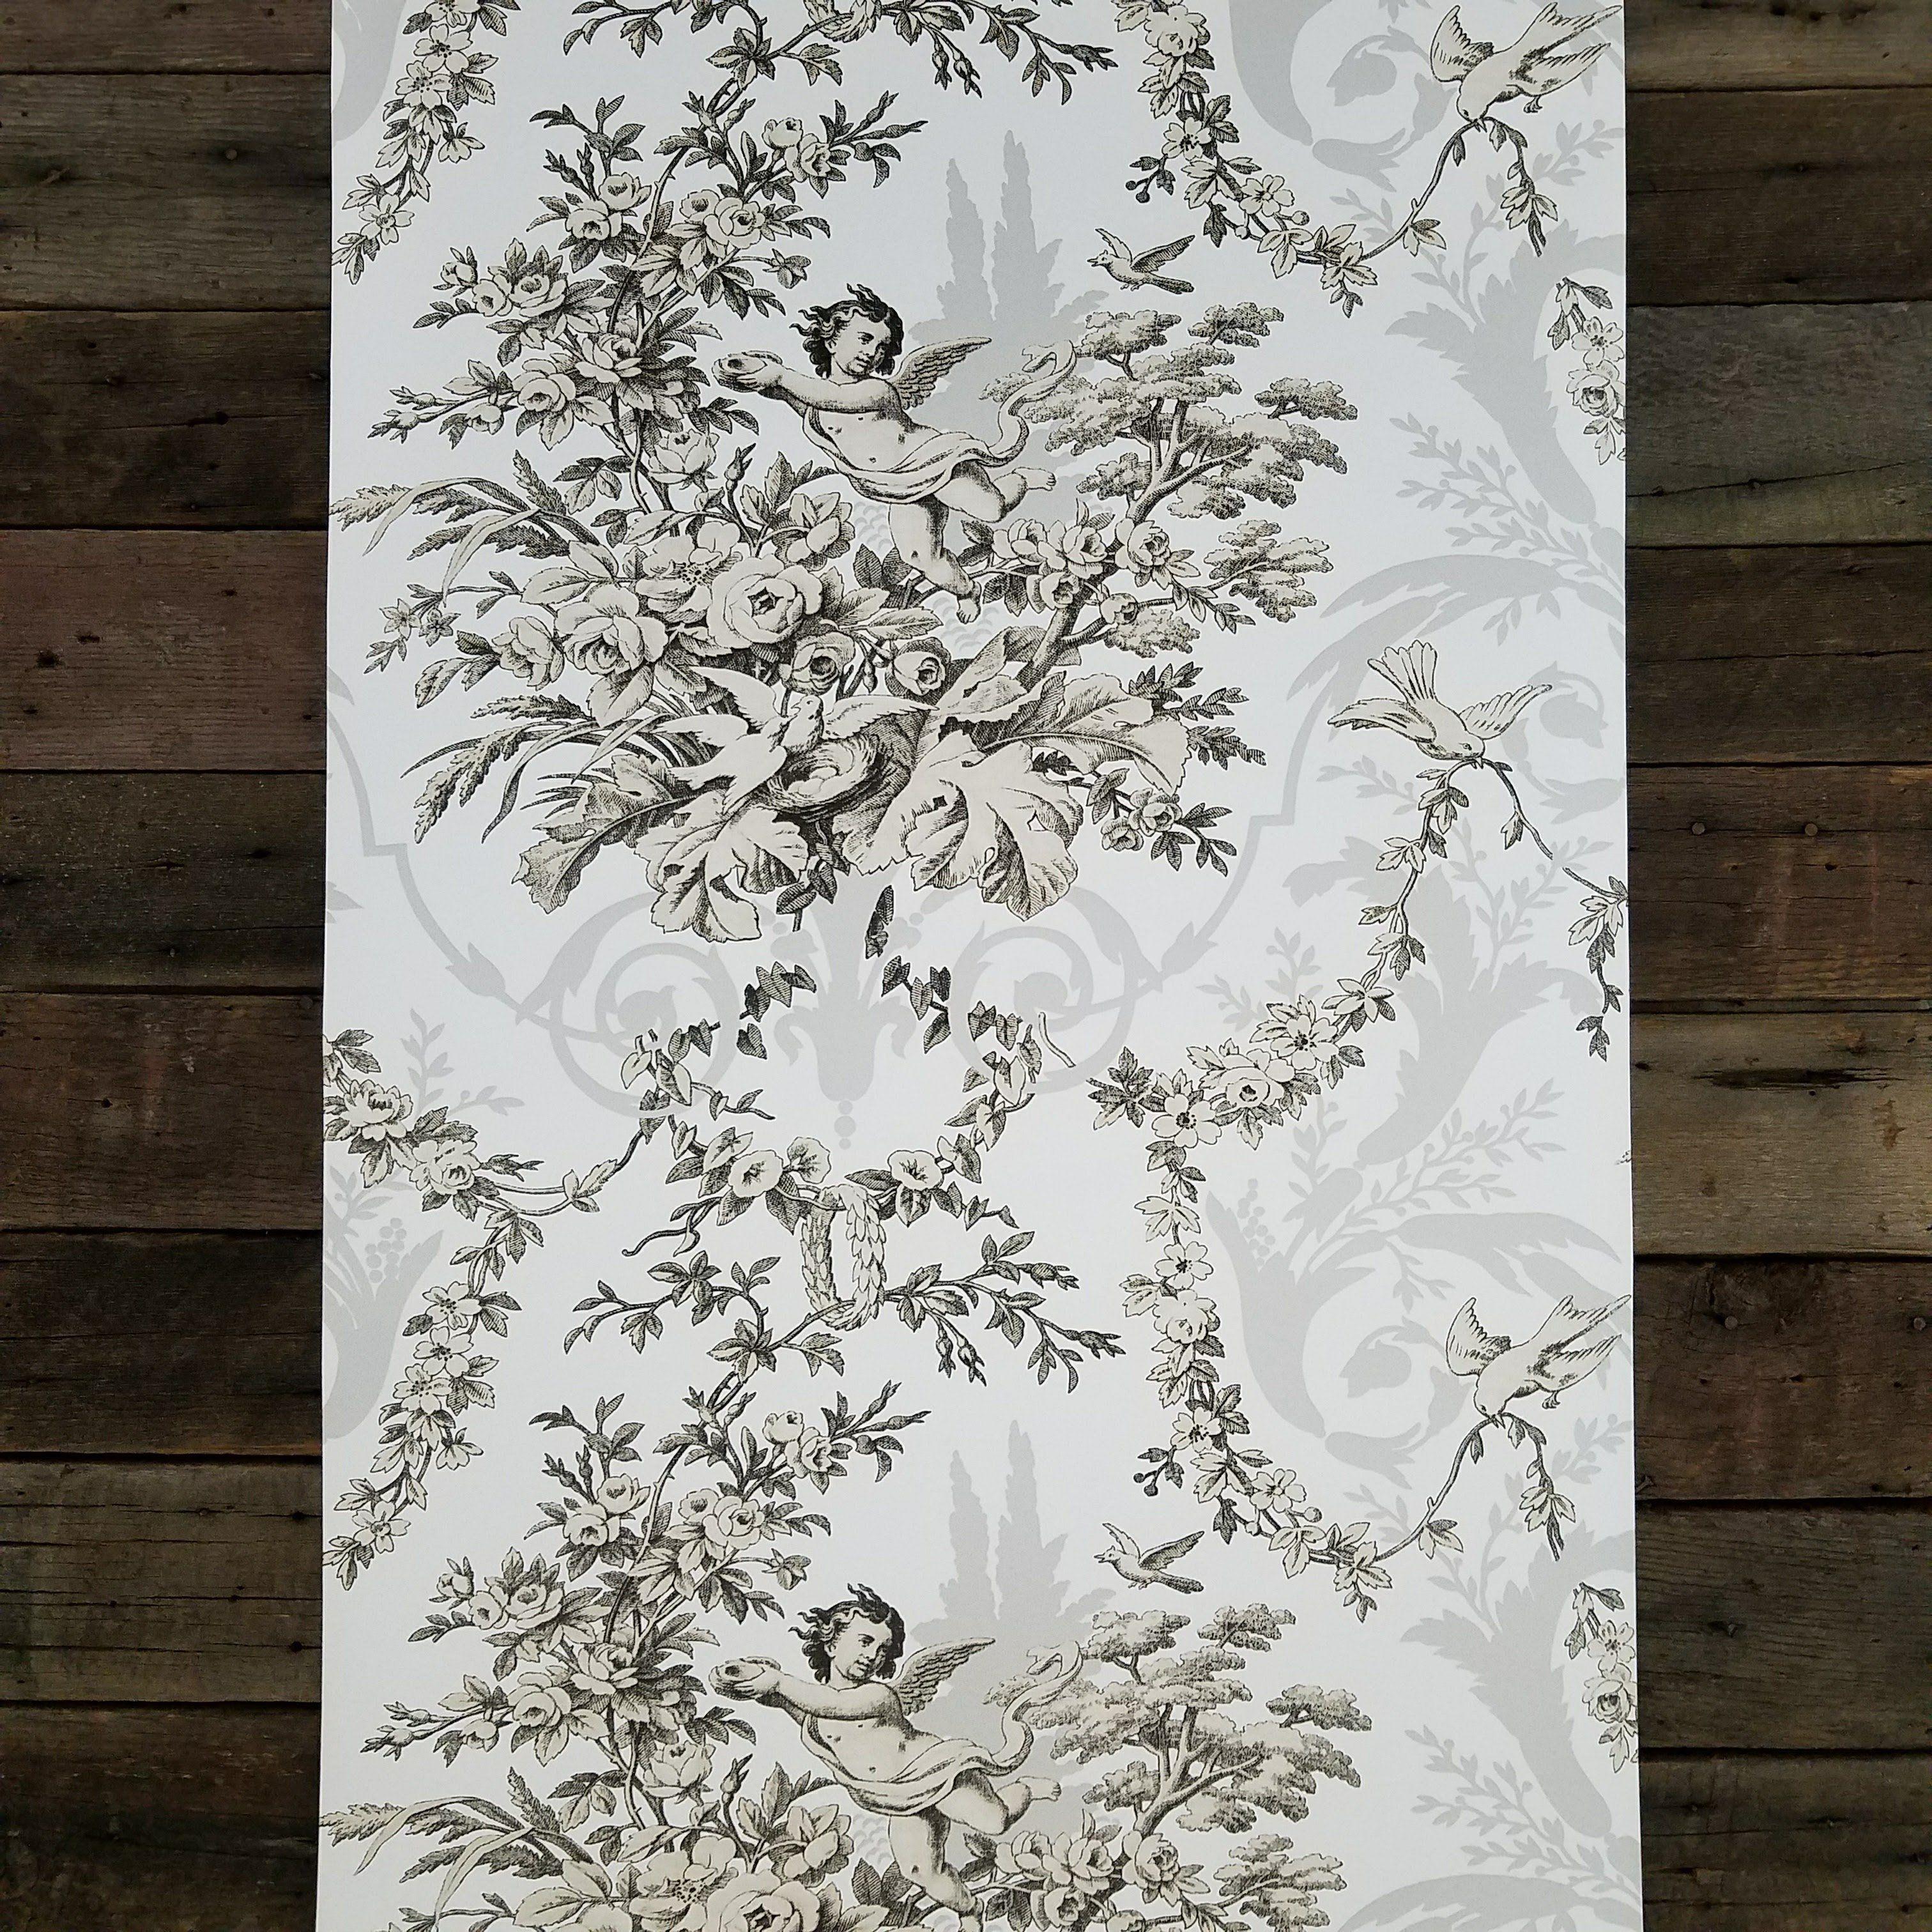 Victorian Cherub Floral Wallpaper in Black and White